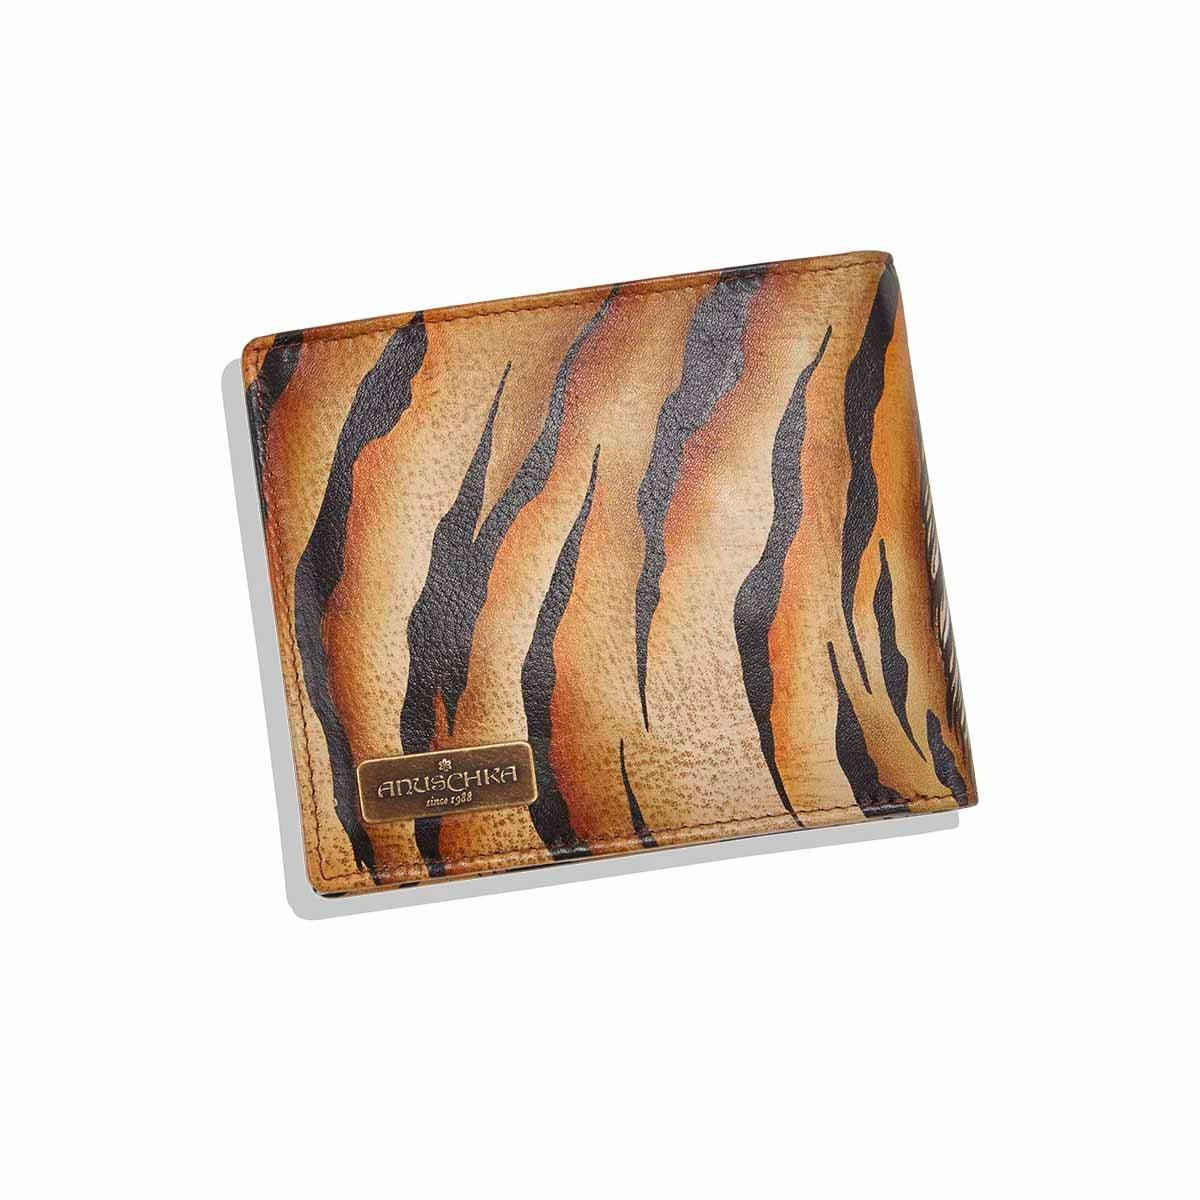 Mns painted lthr Wild Tiger wallet